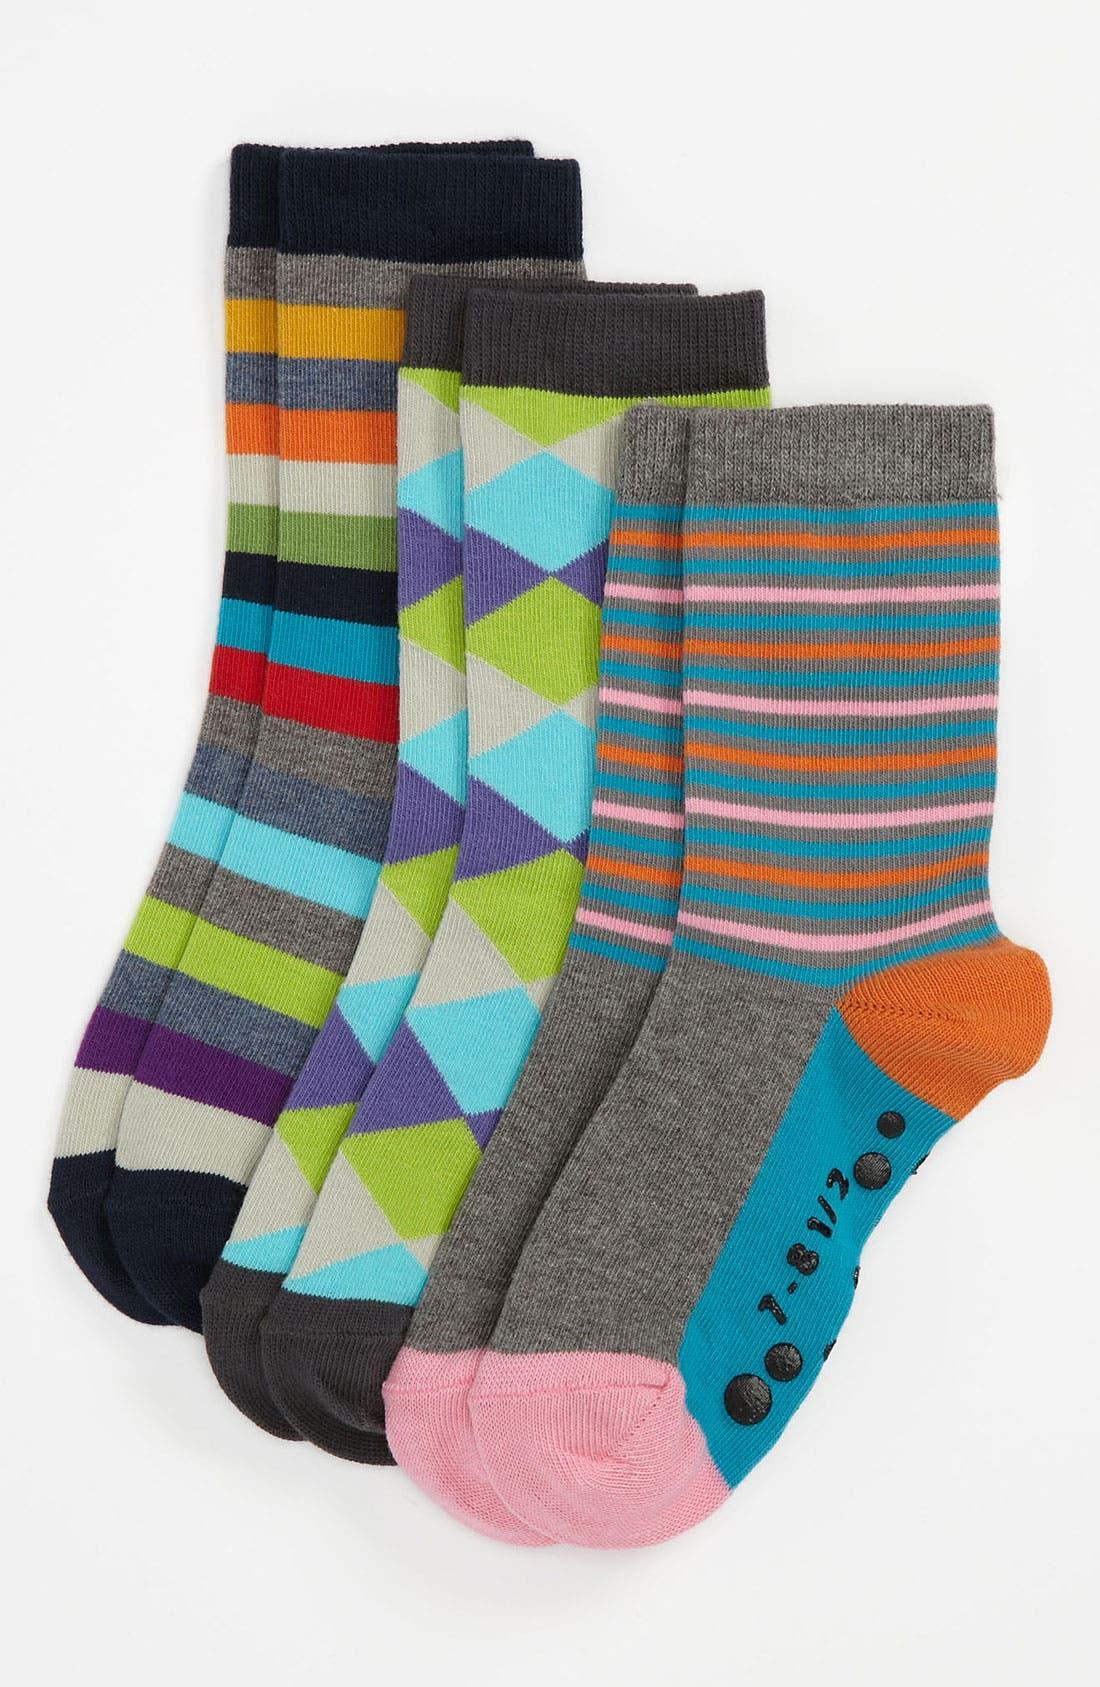 Main Image - Nordstrom 'Get Happy' Crew Socks (3-Pack) (Kids)